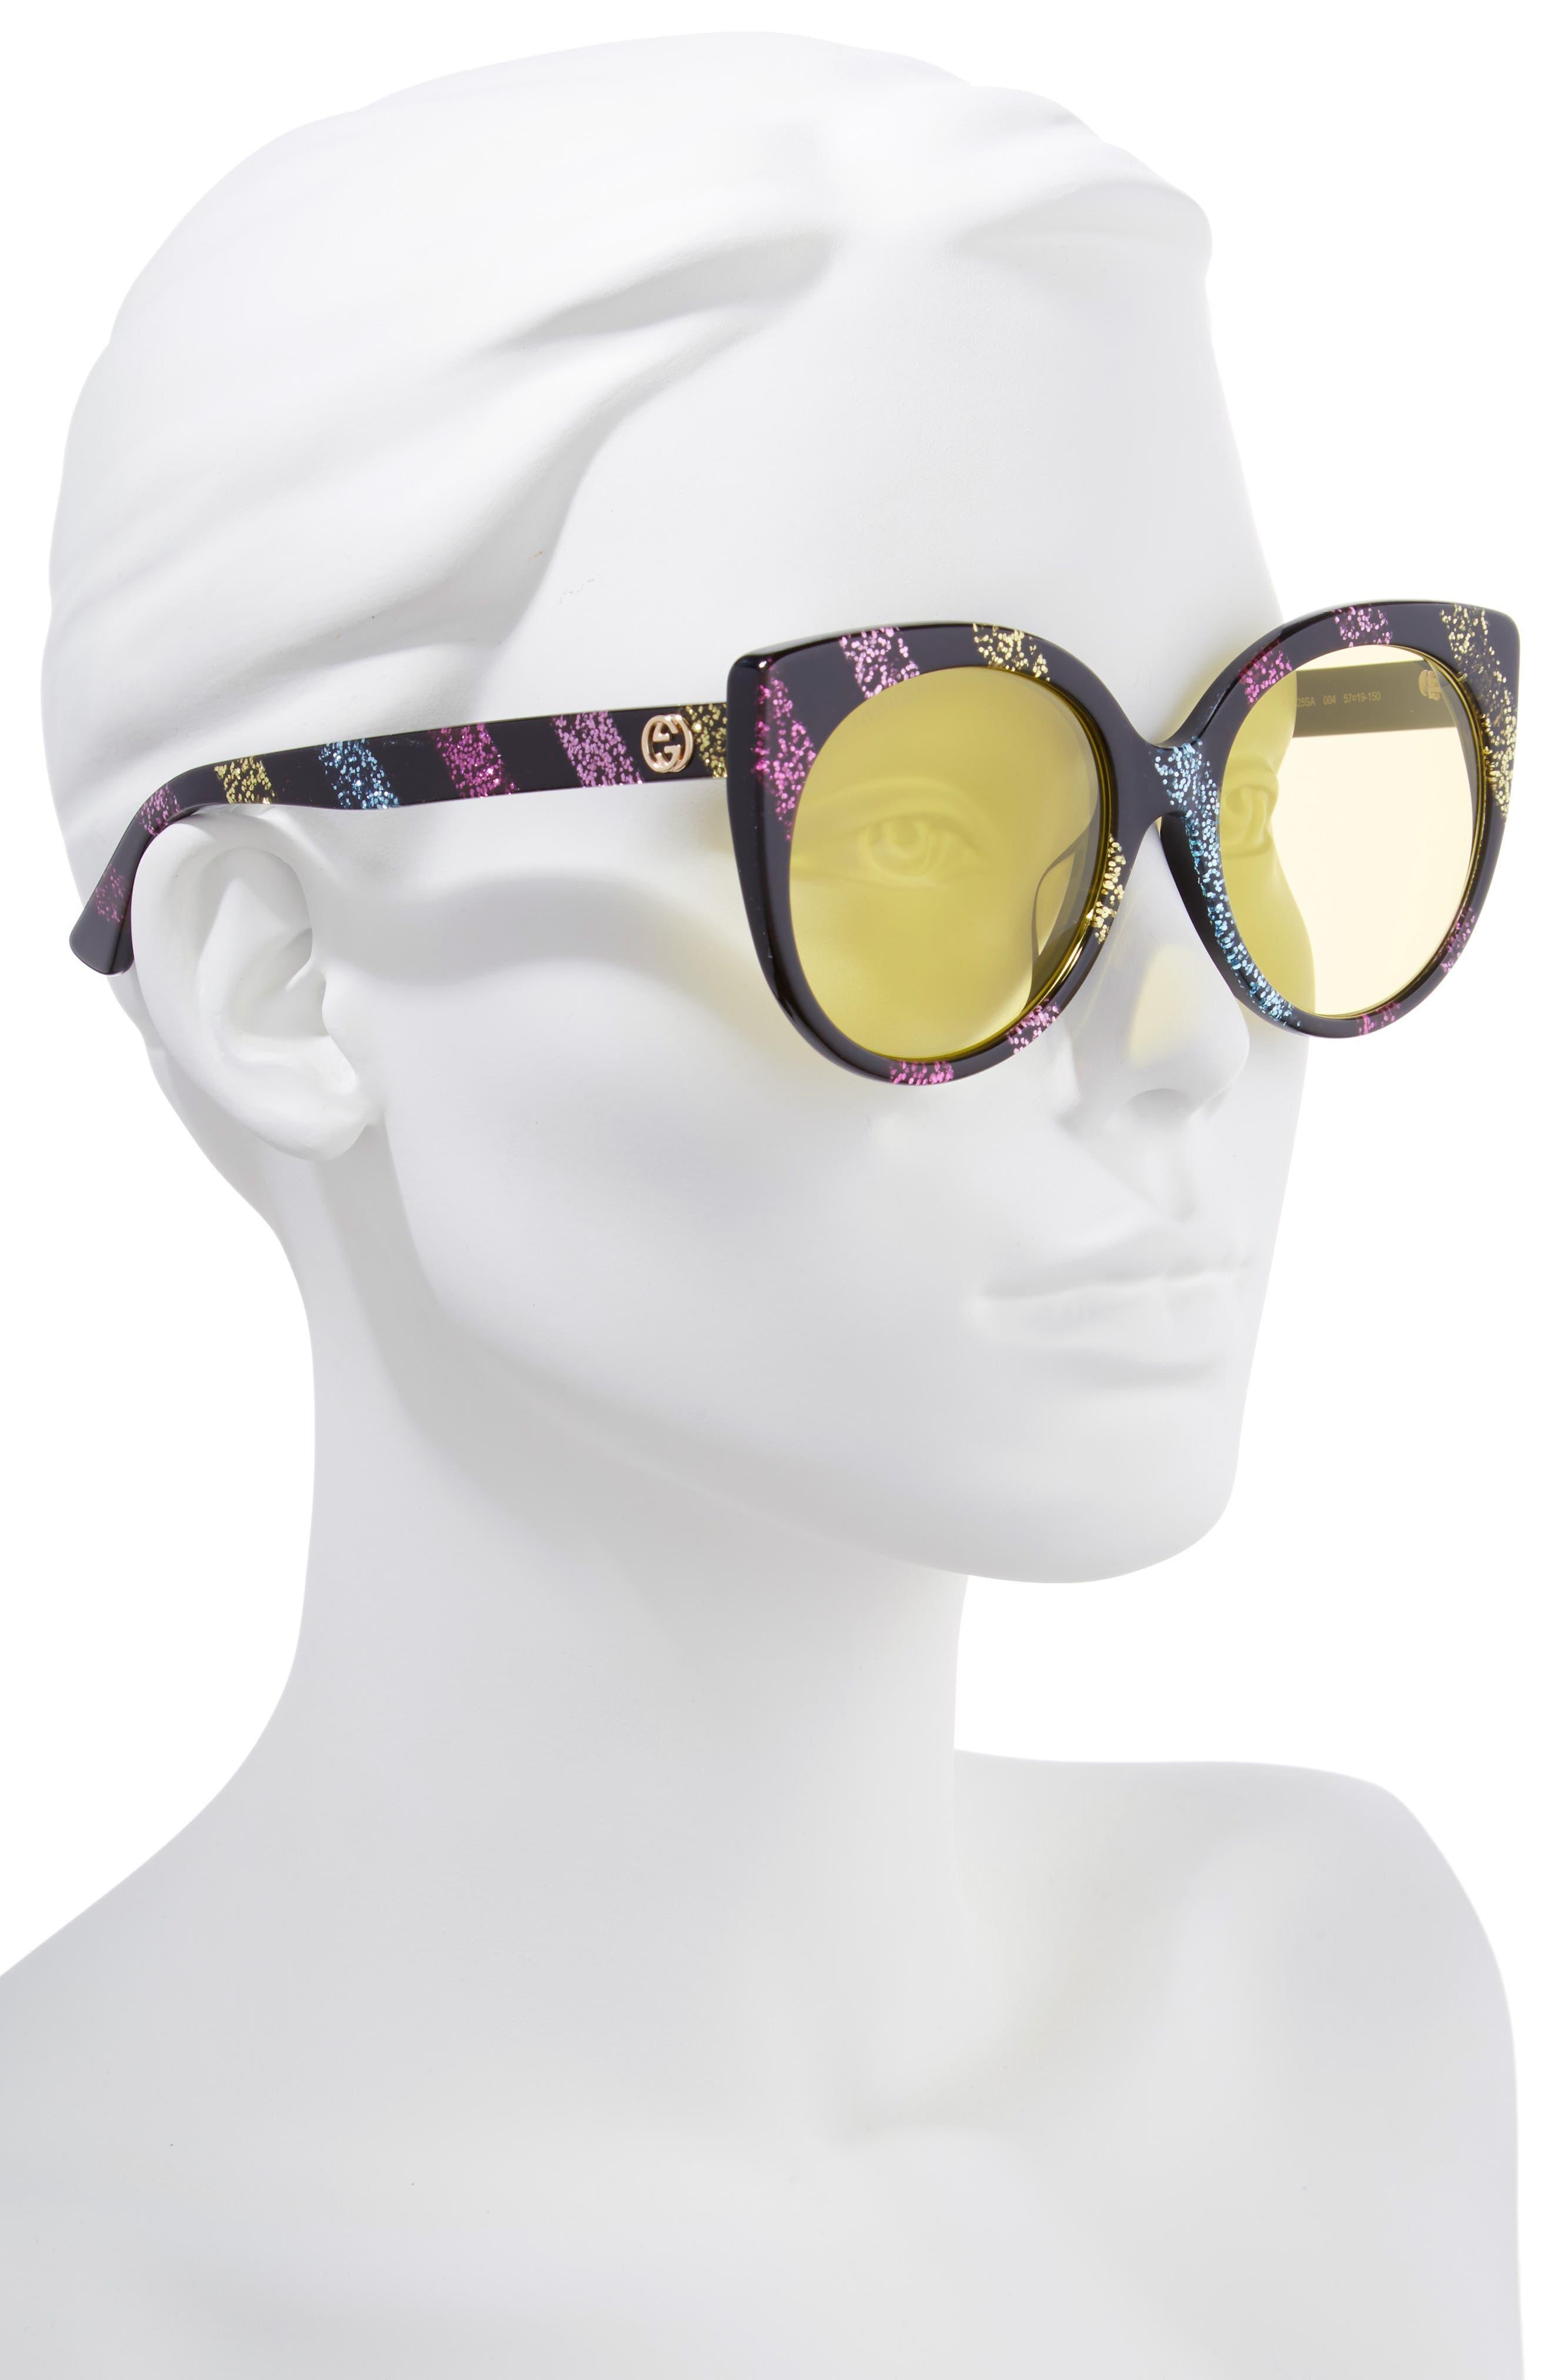 57mm Cat Eye Sunglasses,                             Alternate thumbnail 2, color,                             Pink/ Multicolor